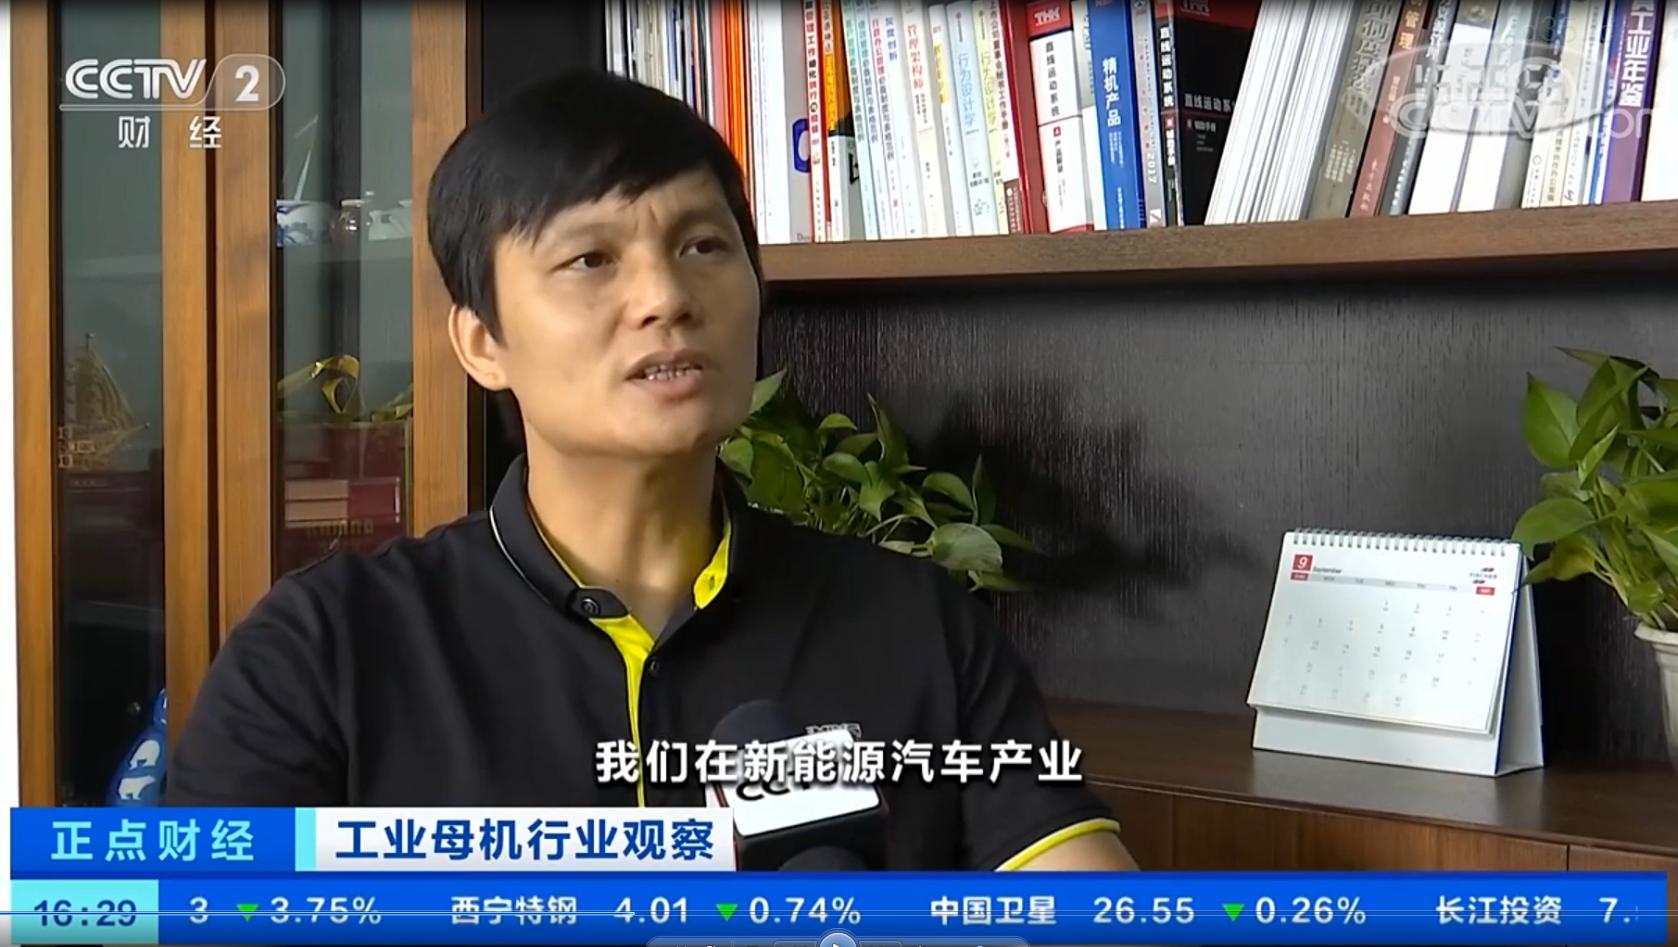 CCTV-2央視財經頻道走進埃弗米